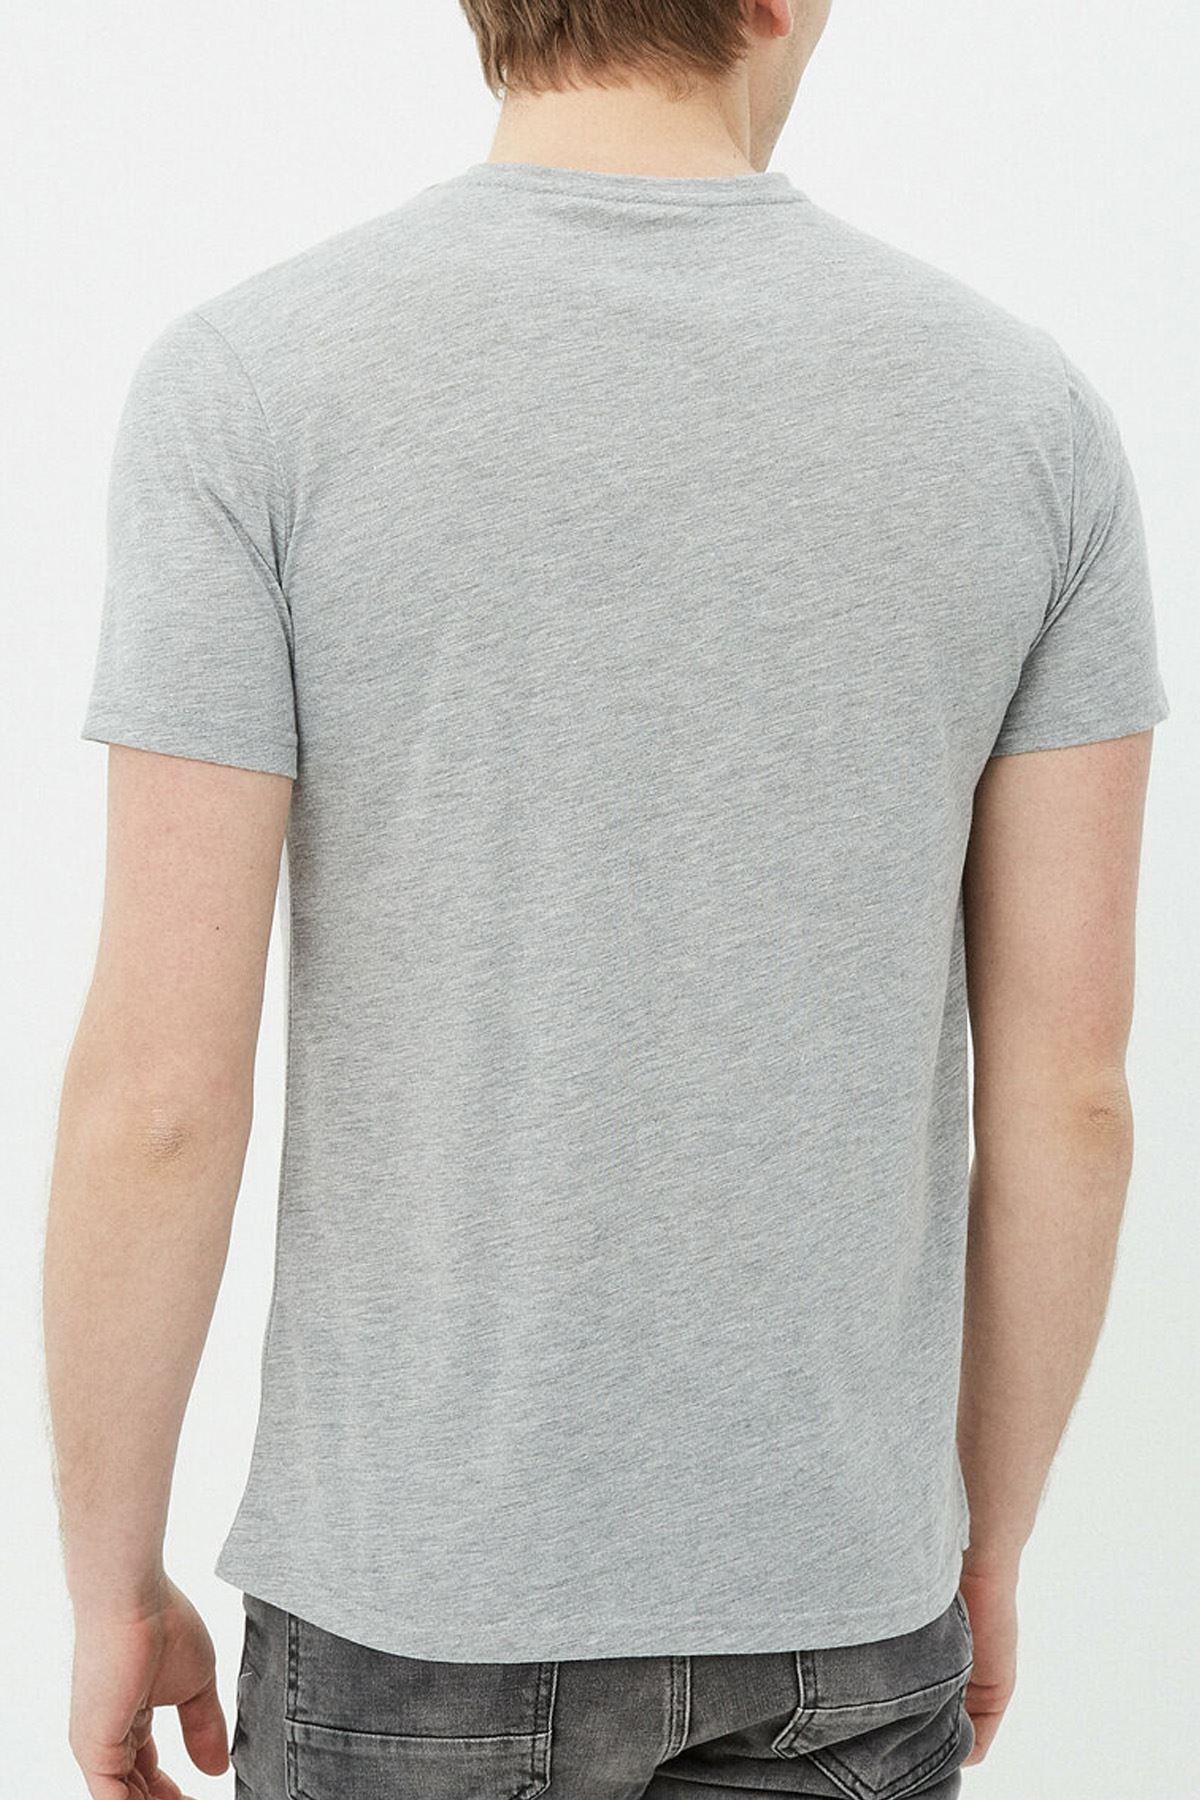 Anime Bebop 04 Gri Erkek Tshirt - Tişört